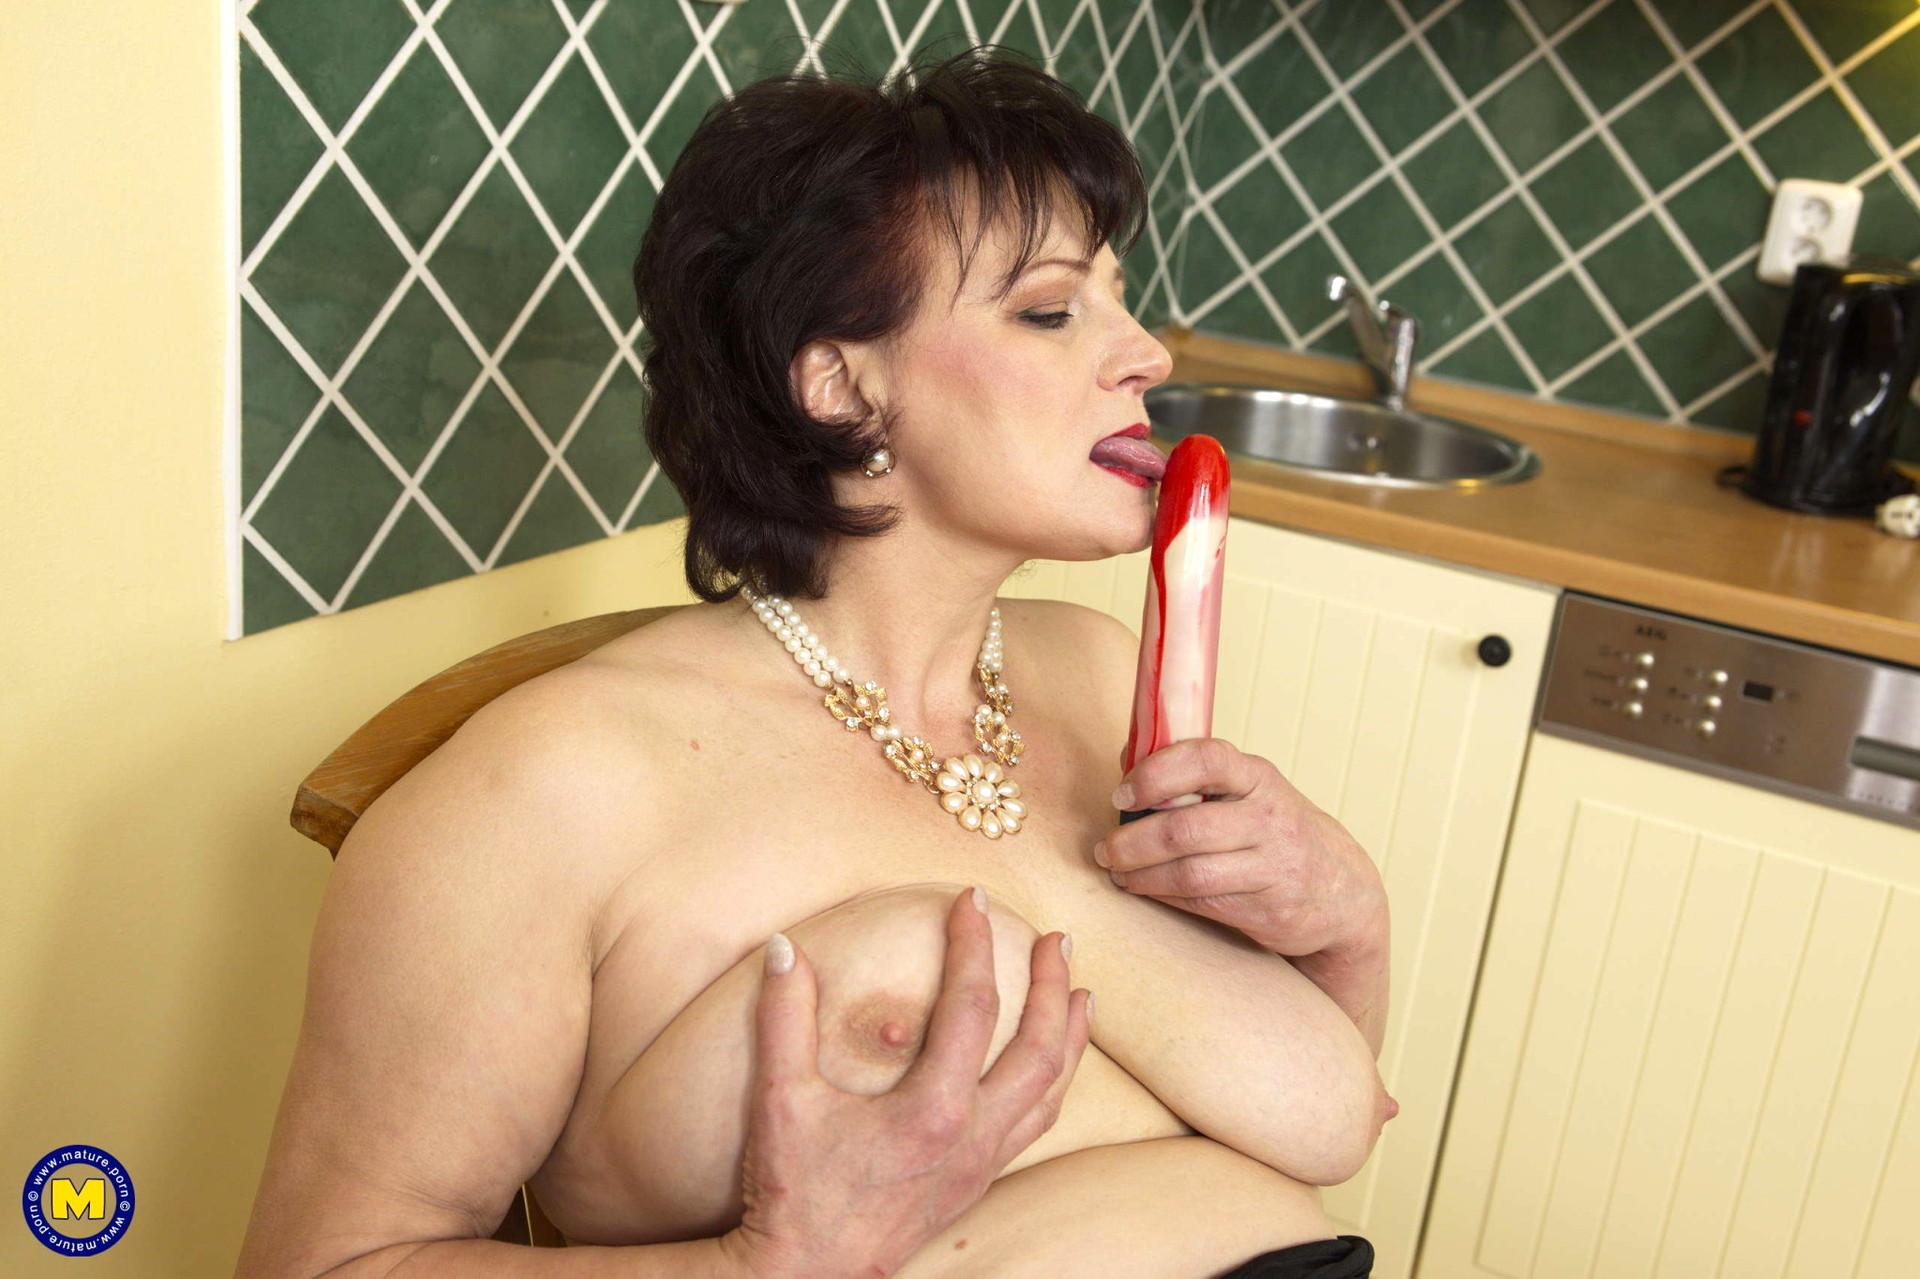 vega hot boobs sex nude images